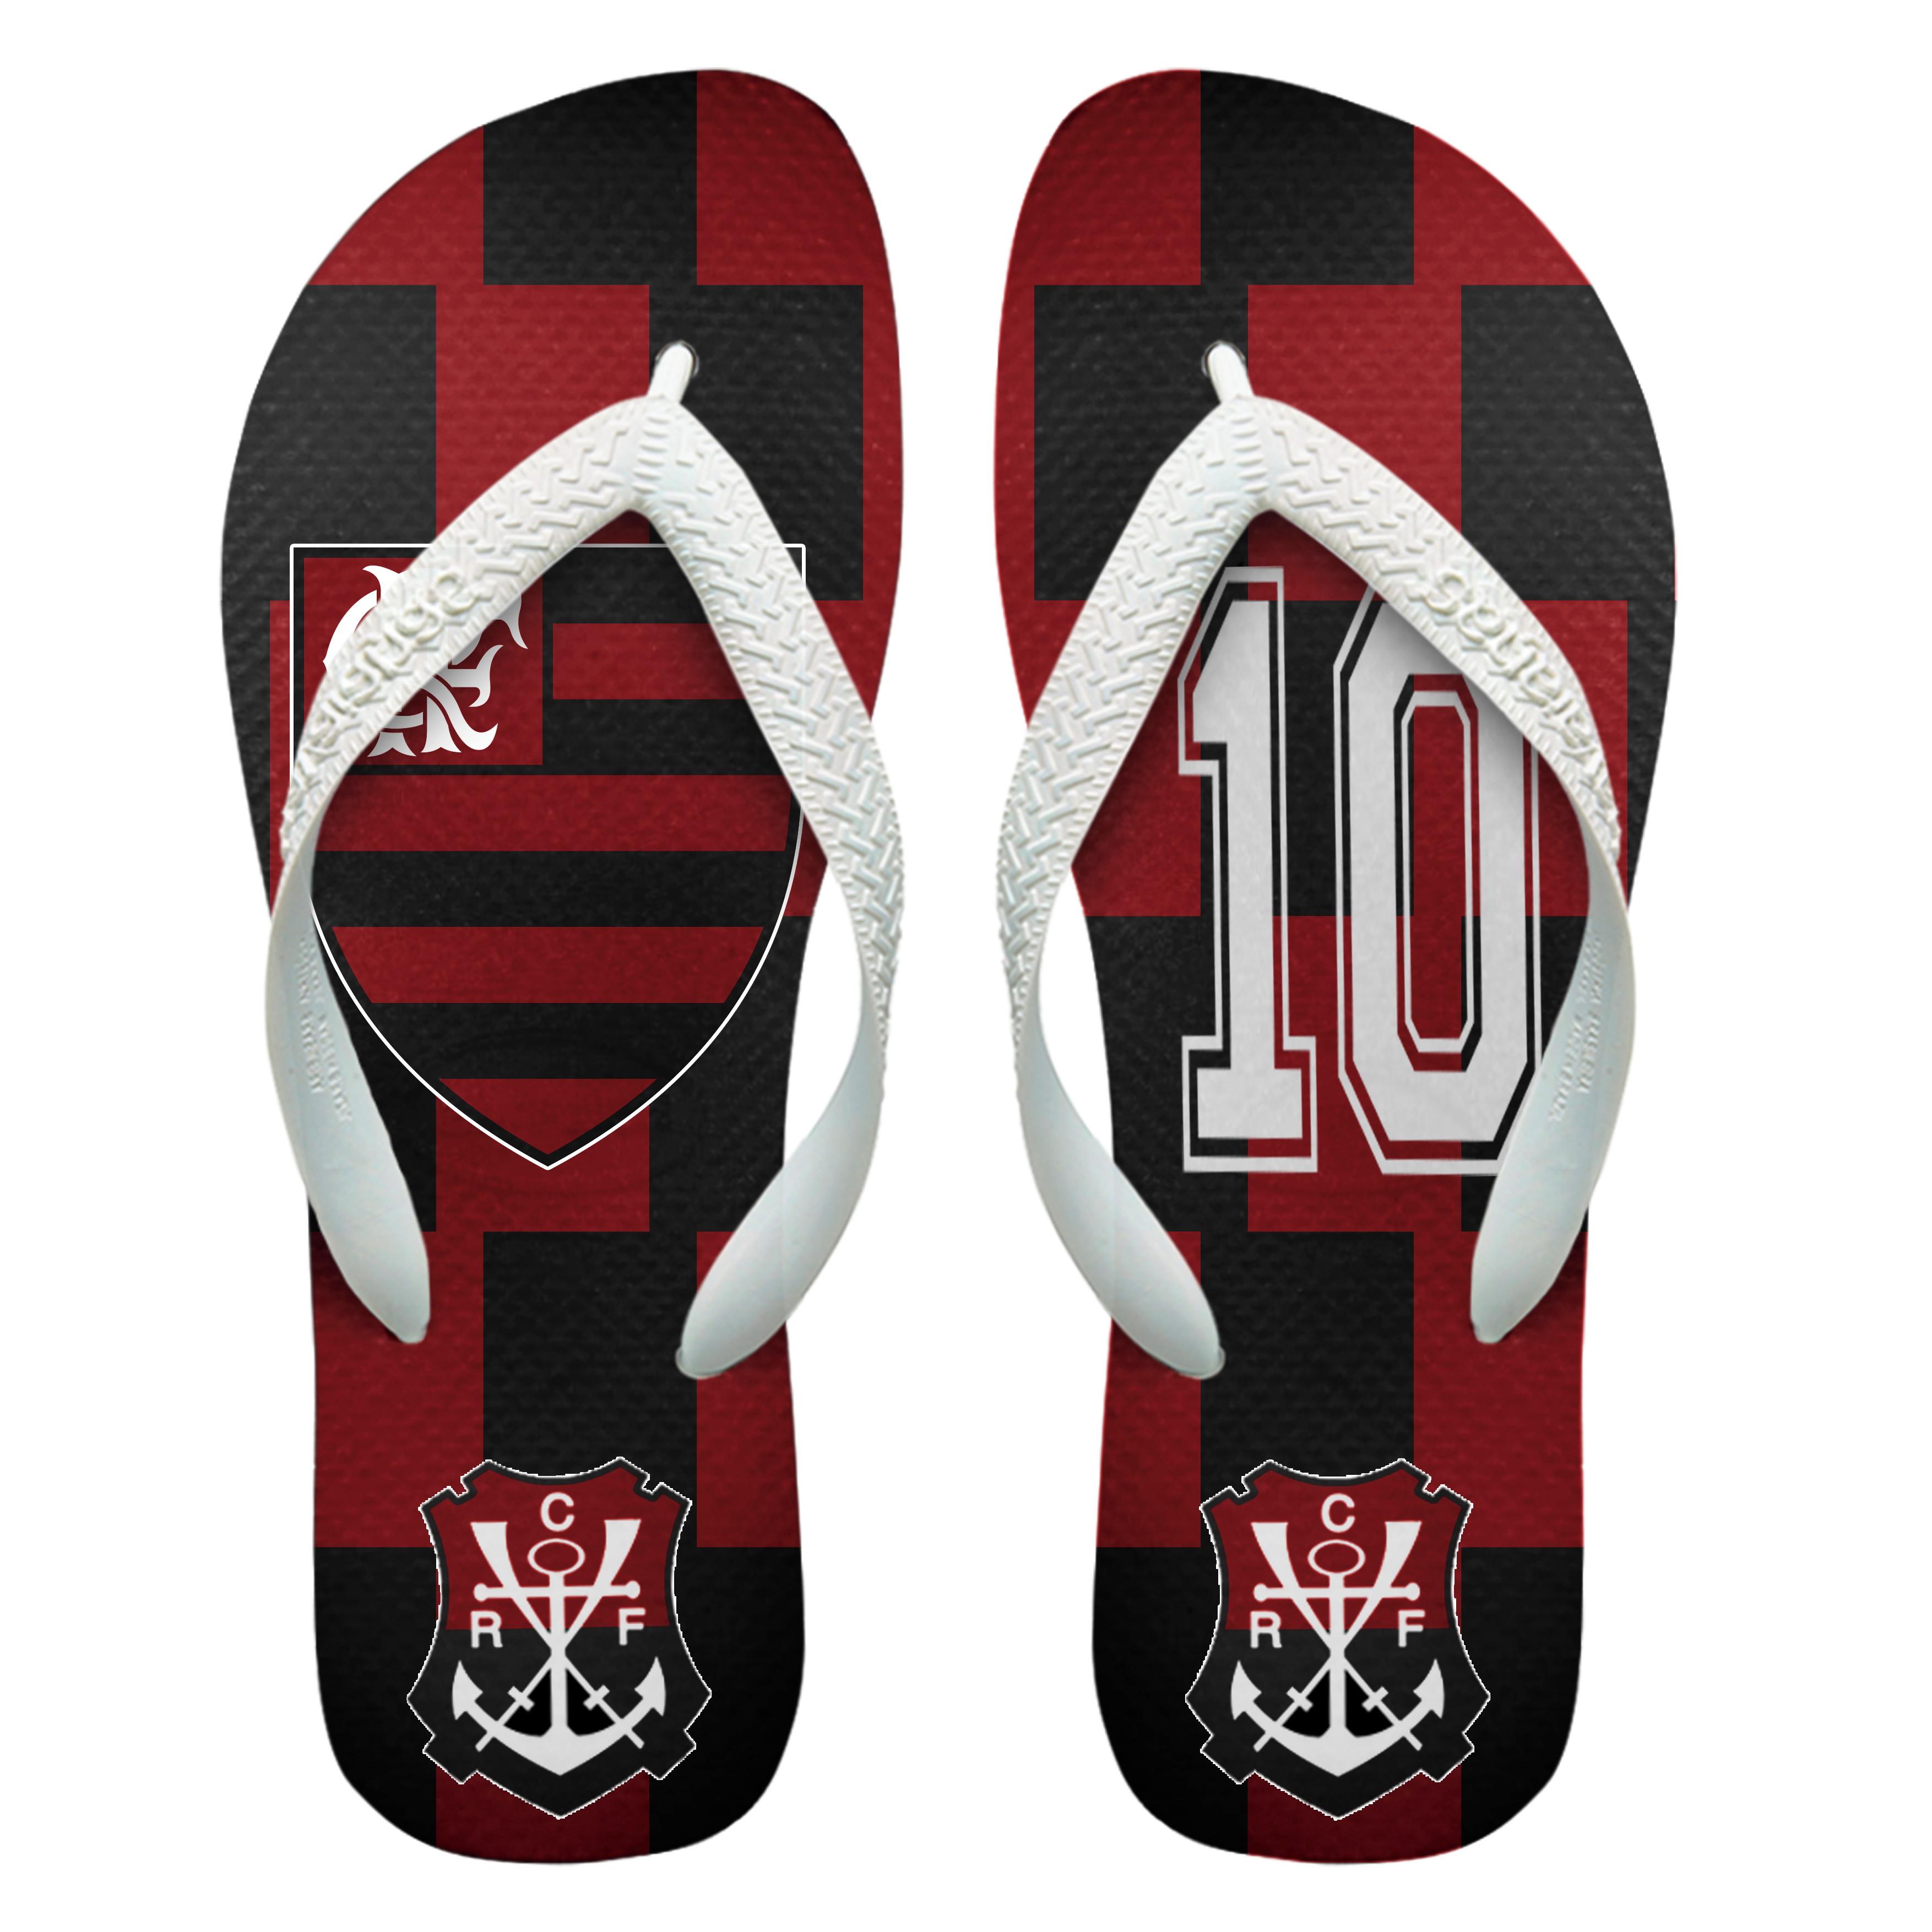 589227b72ae98d Chinelos Personalizados Havaianas Flamengo [5]